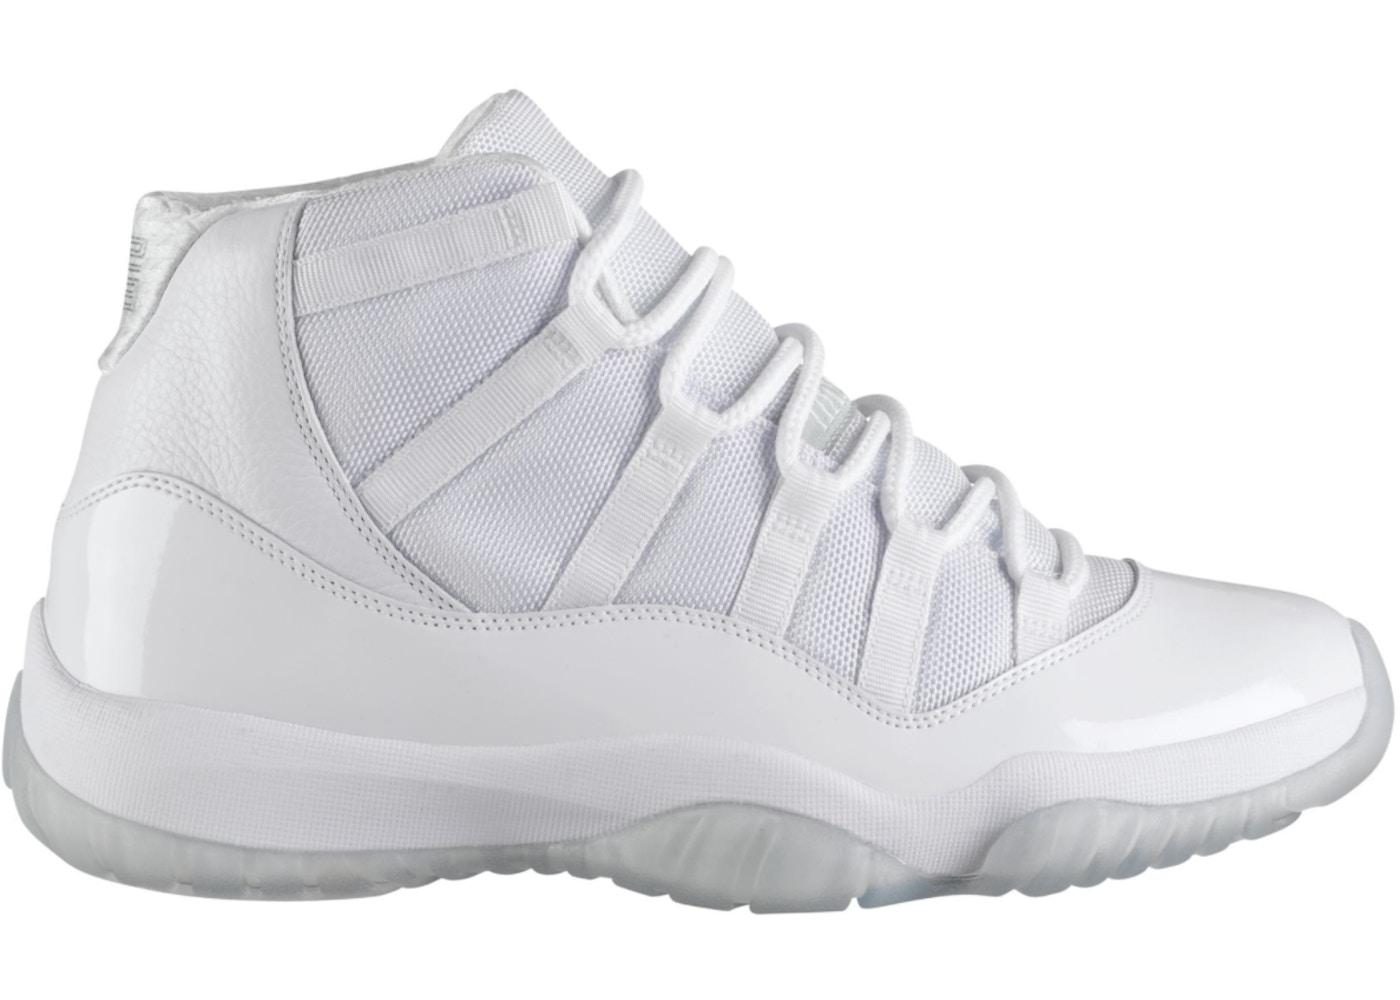 sports shoes 1778c 974a3 Jordan 11 Retro Silver Anniversary (GS)